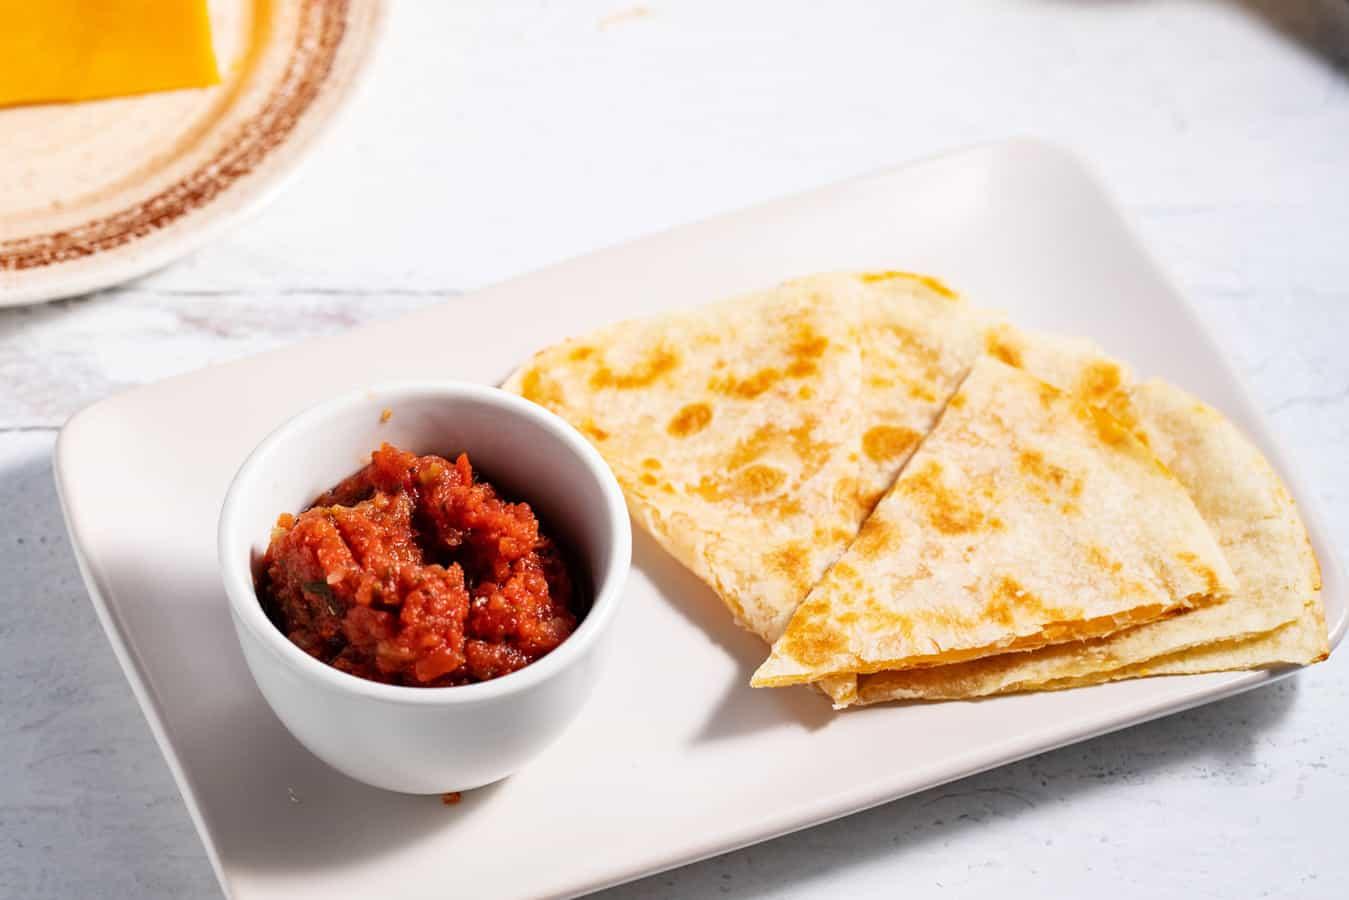 quesadilla and salsa